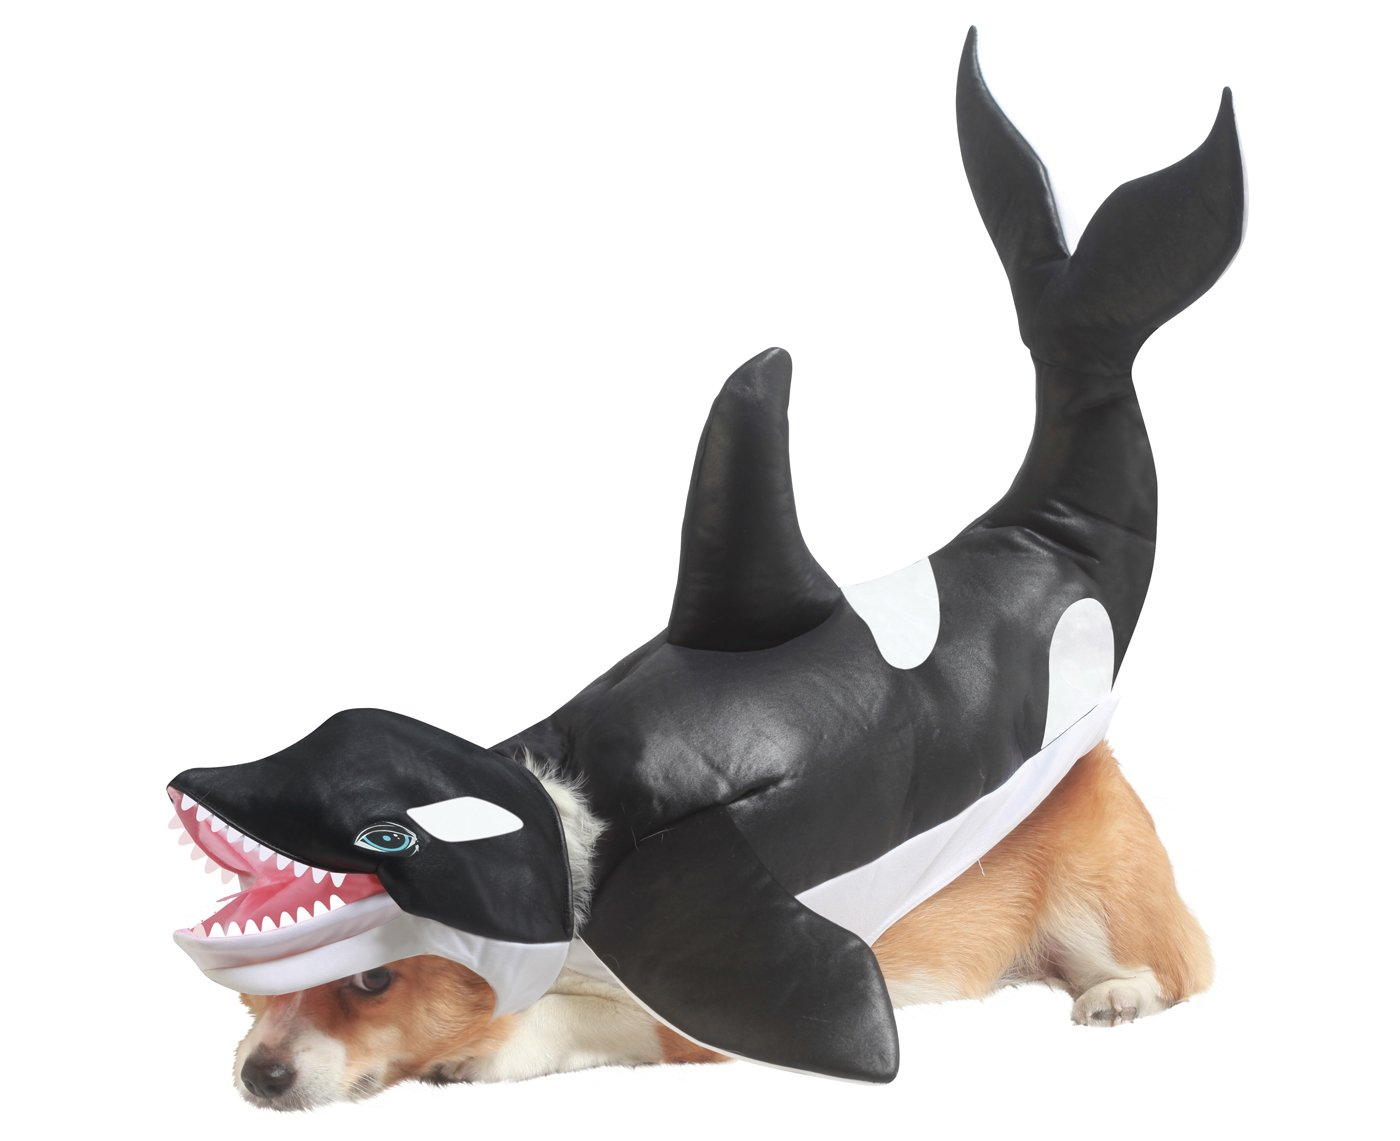 Animal Planet Orca Dog Costume, Medium, Black/White